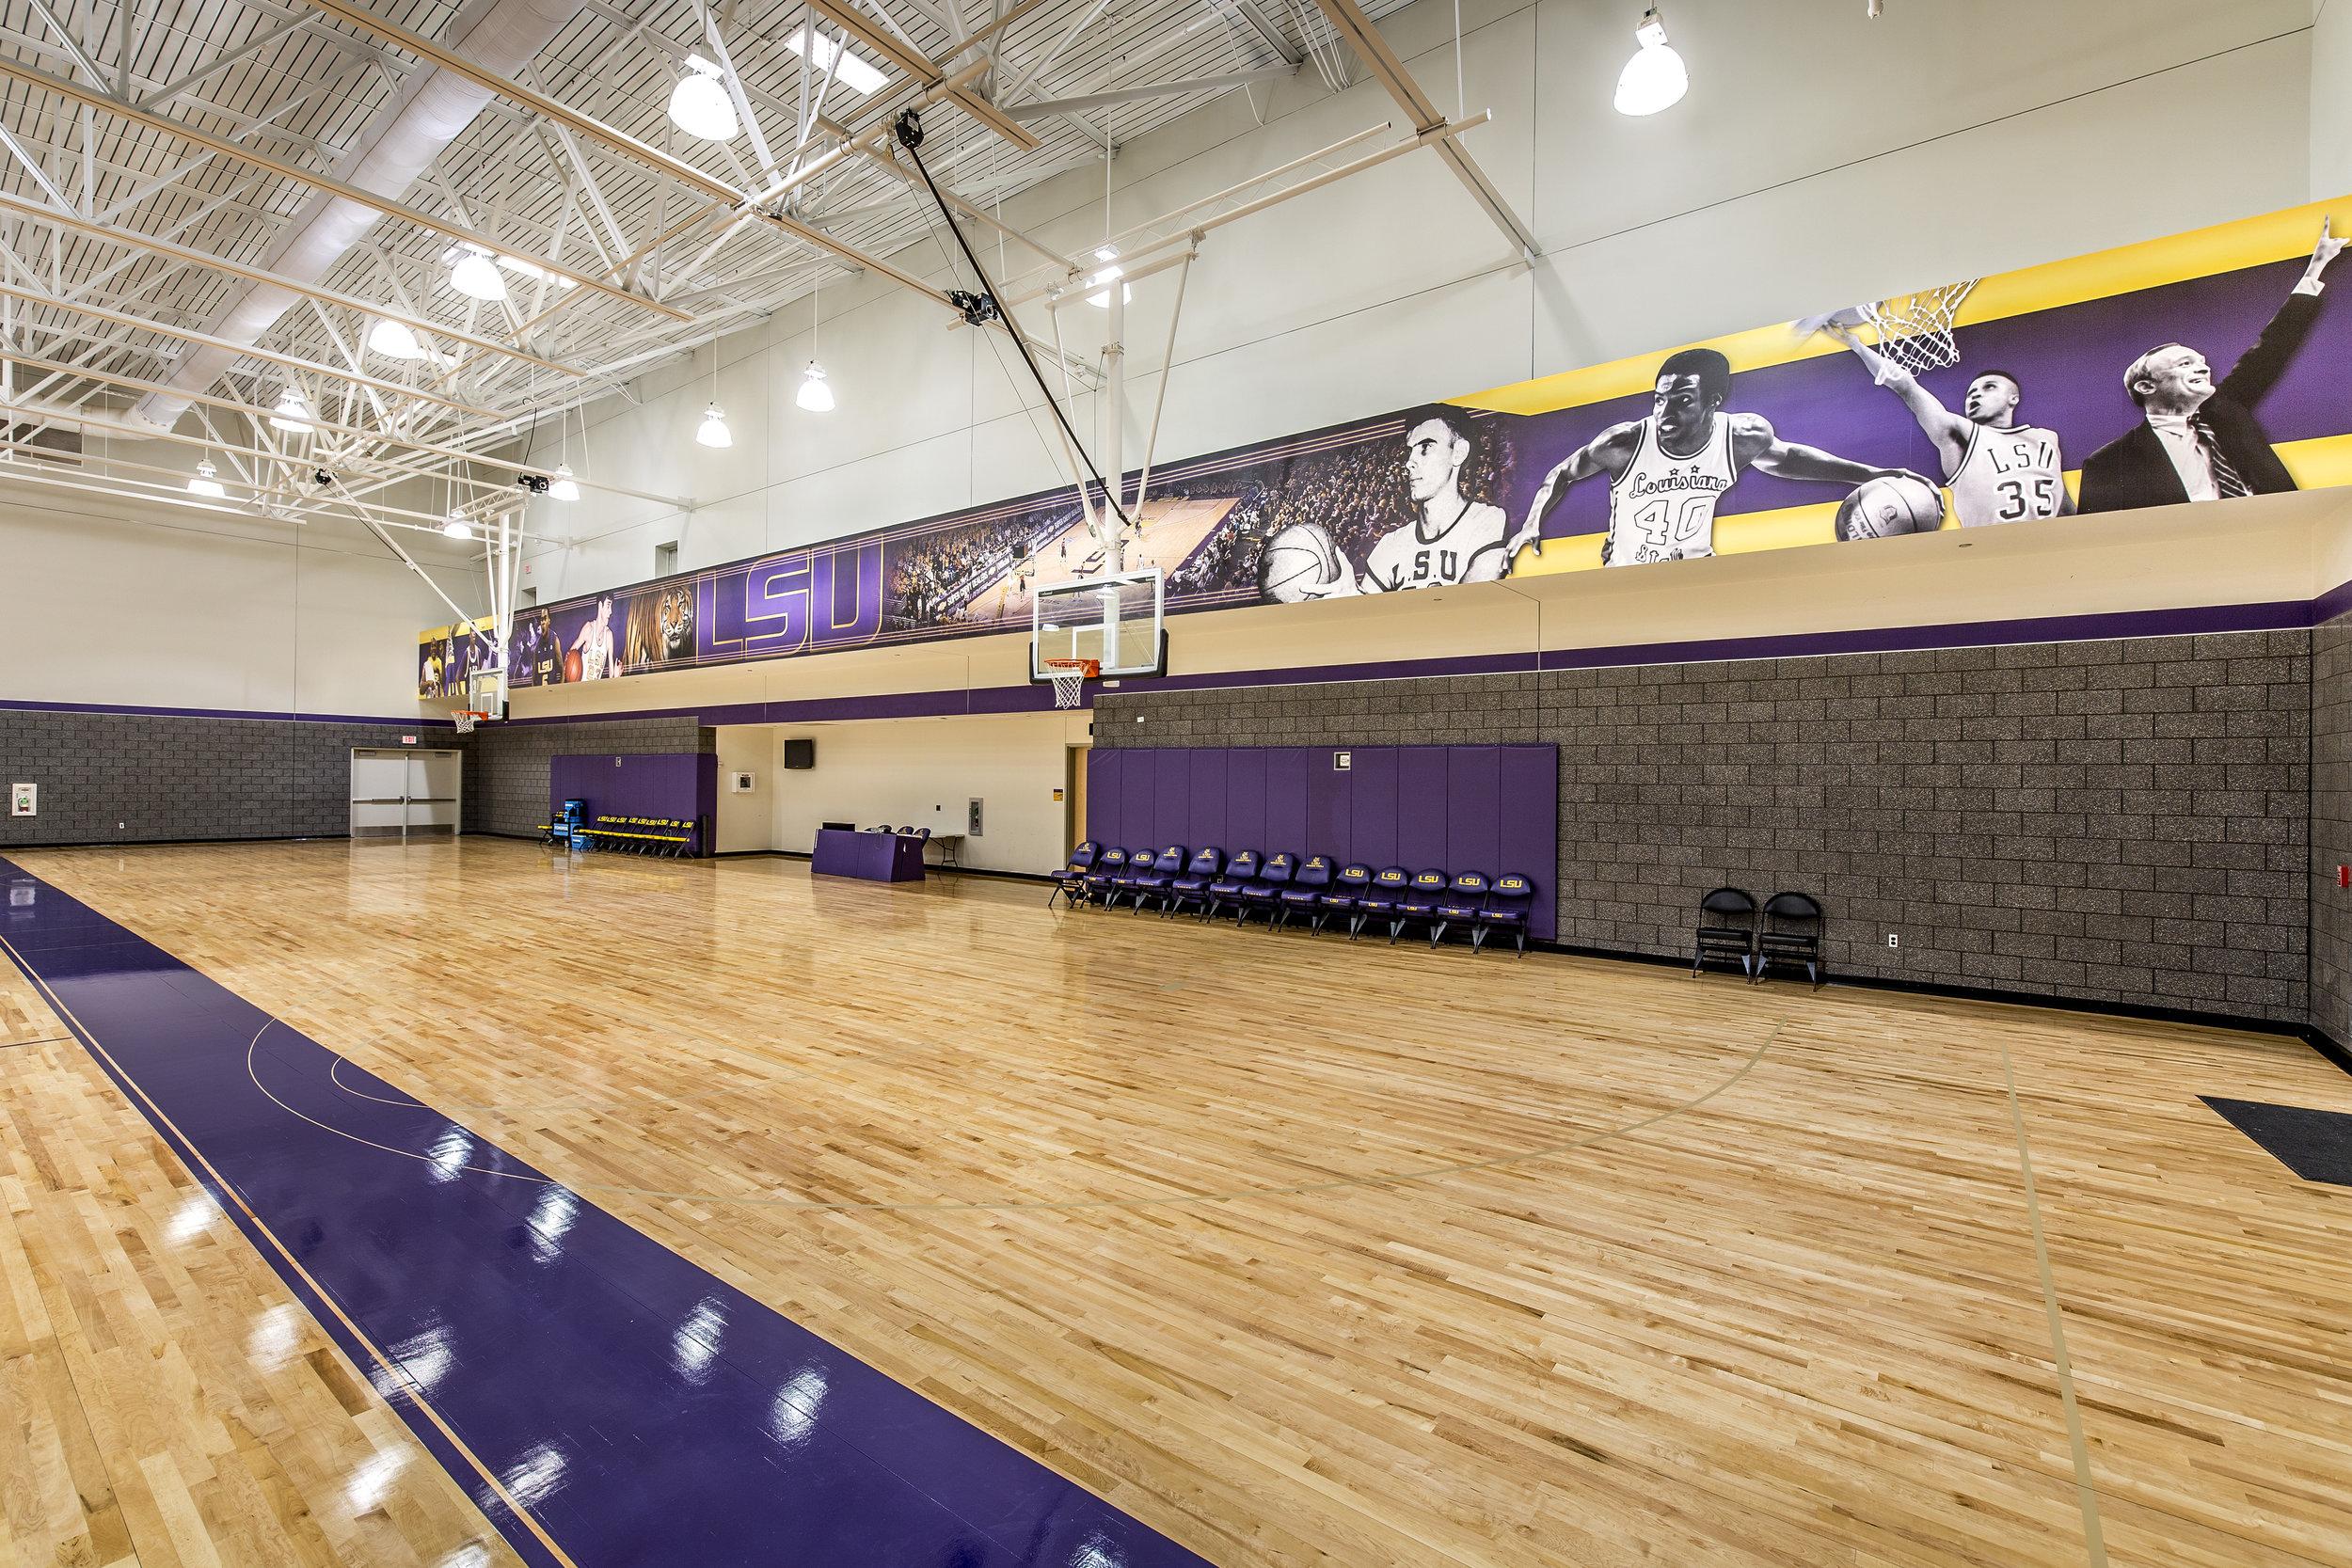 eP9691 49 Degrees - LSU Basketball Training Facility .jpg